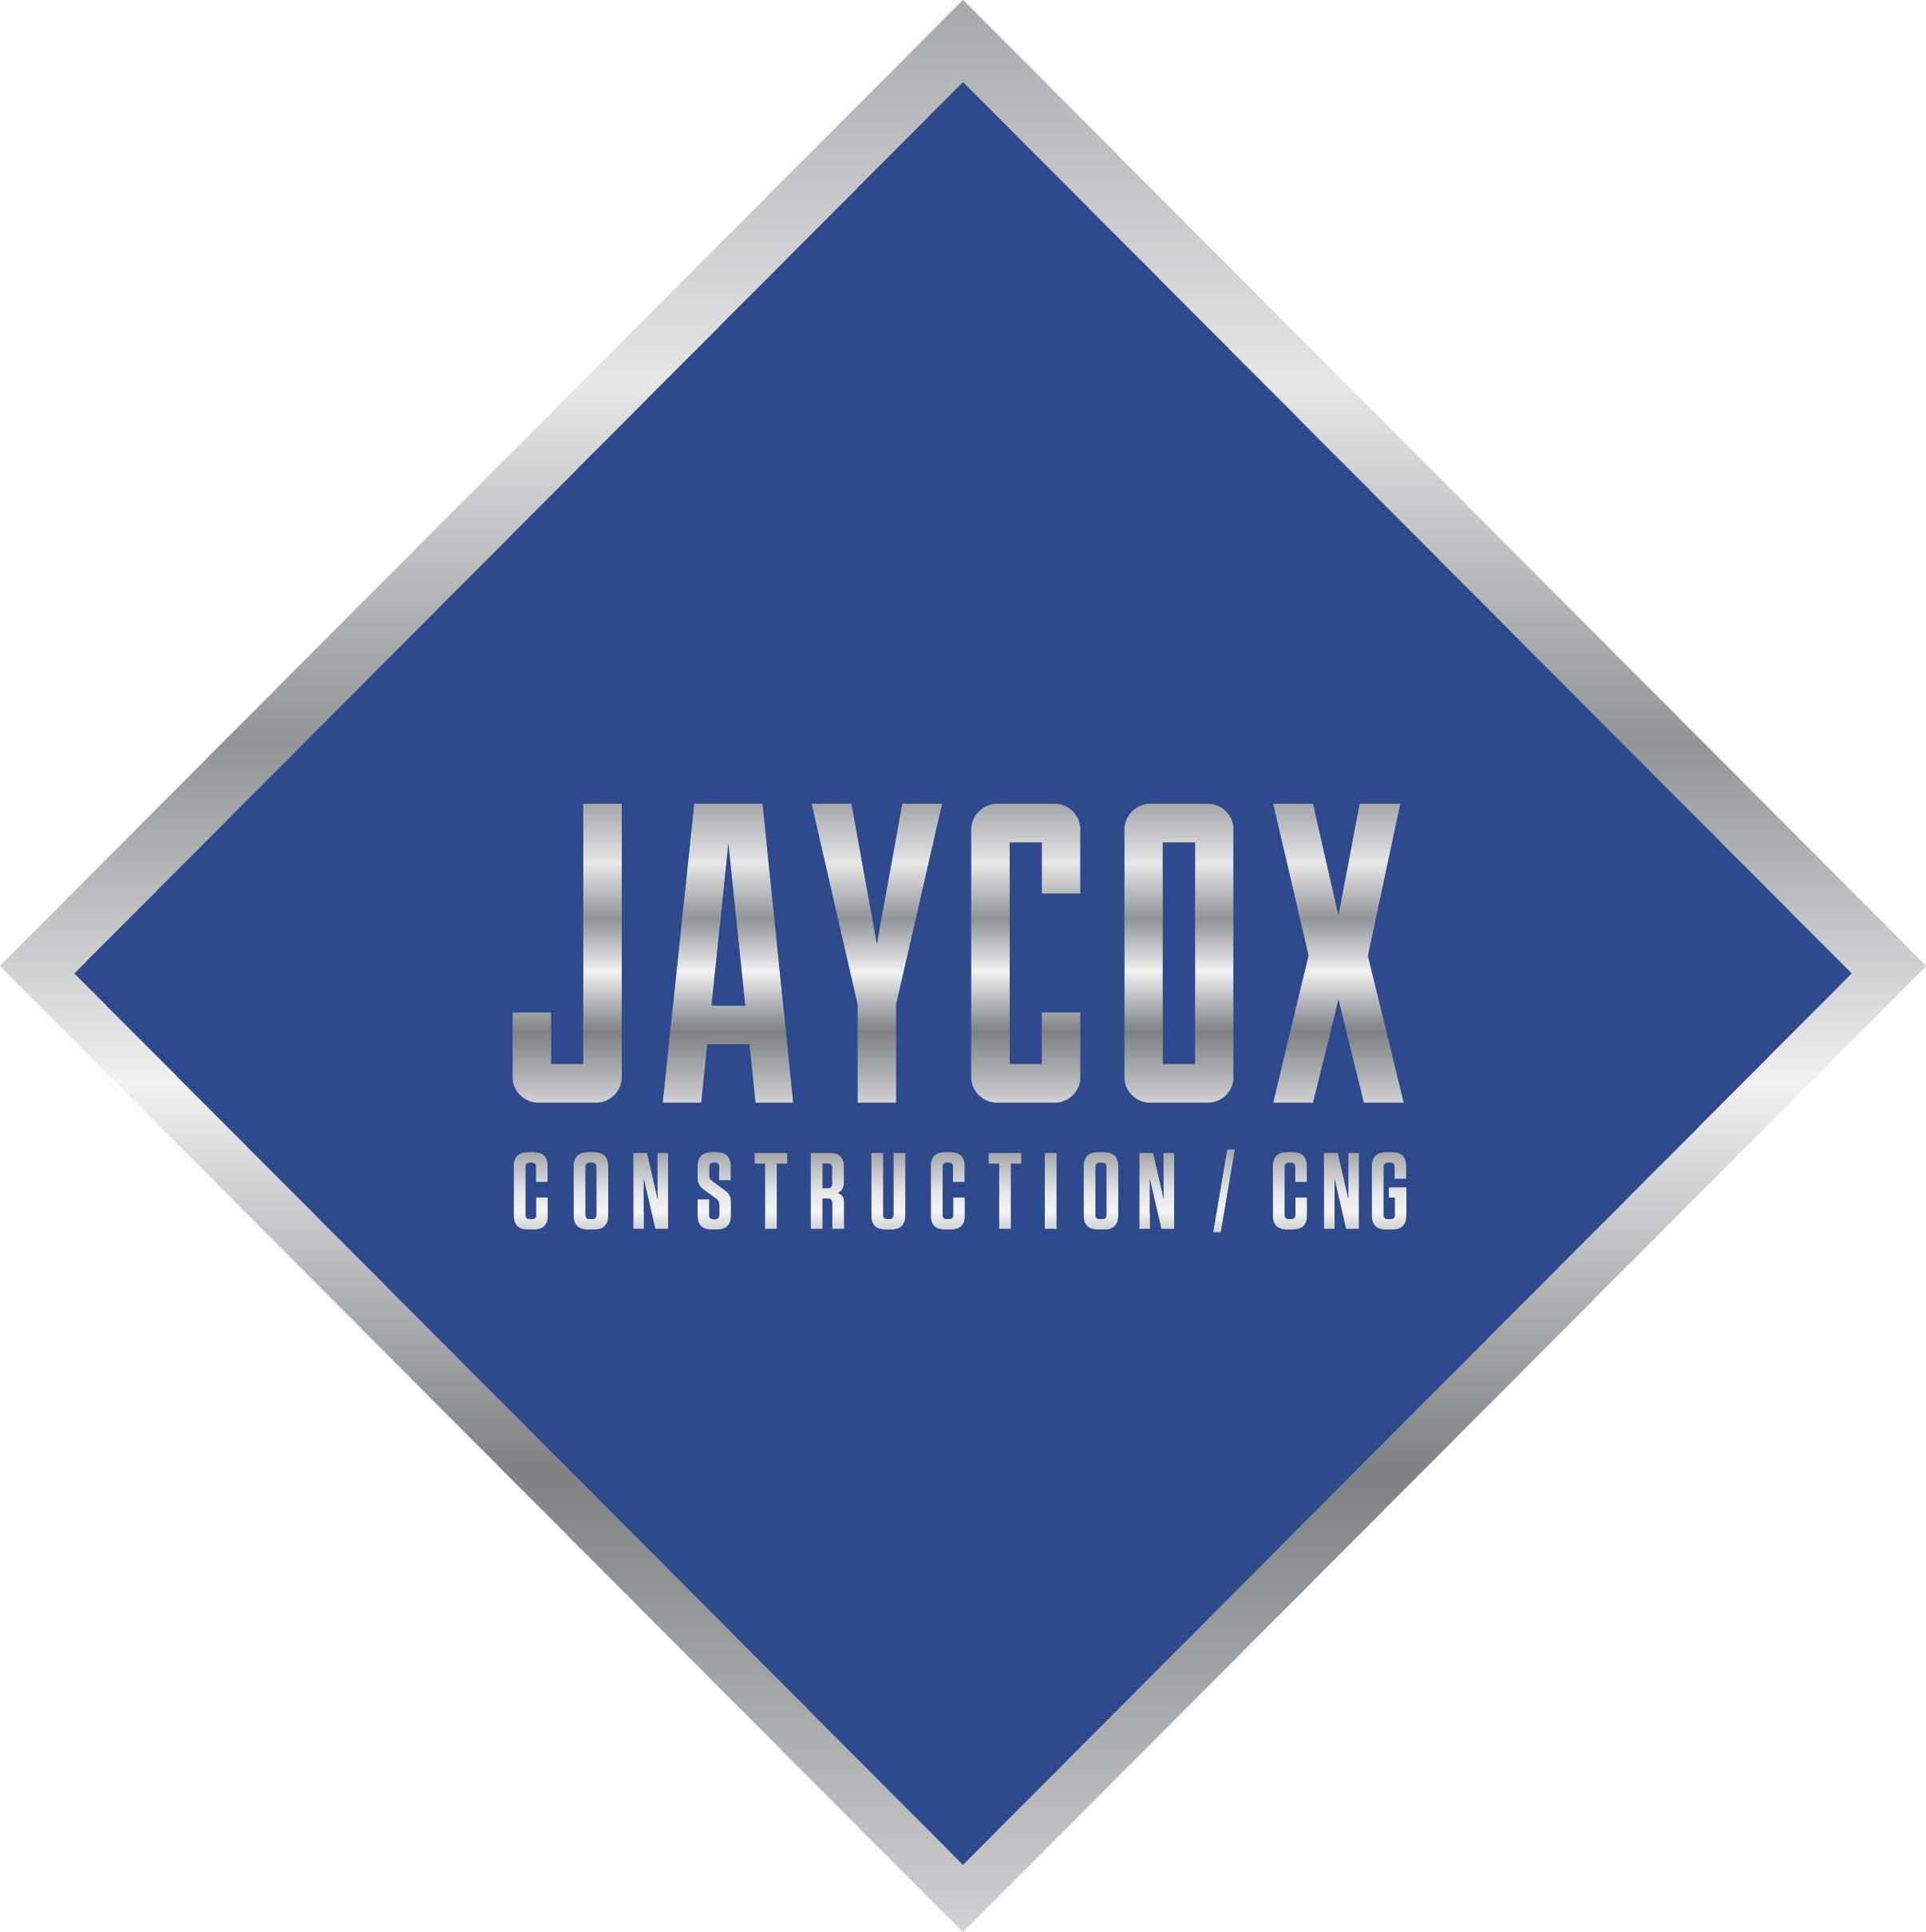 JaycoxLogo.jpg